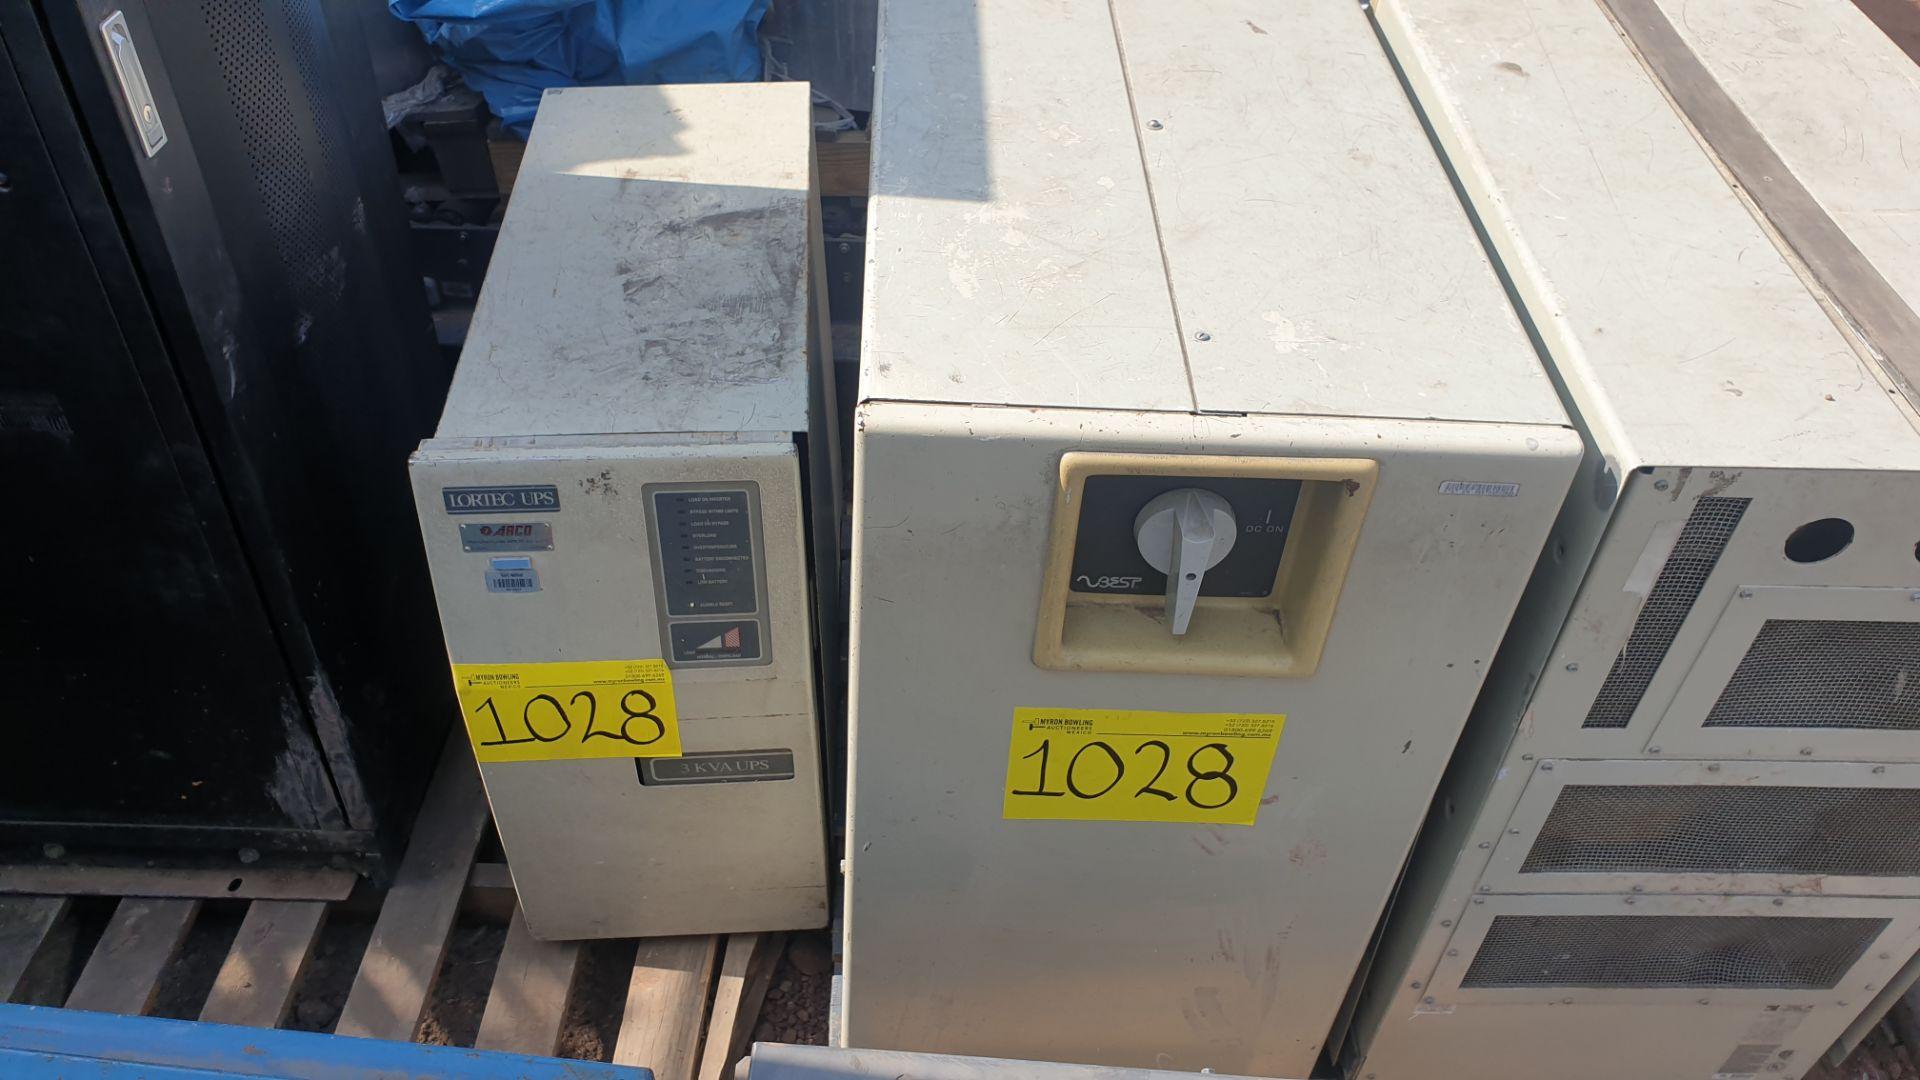 1 Ferrups Power bank system model FD10KVA 208-240V includes Lortec UPS of 3KVA - Image 9 of 11